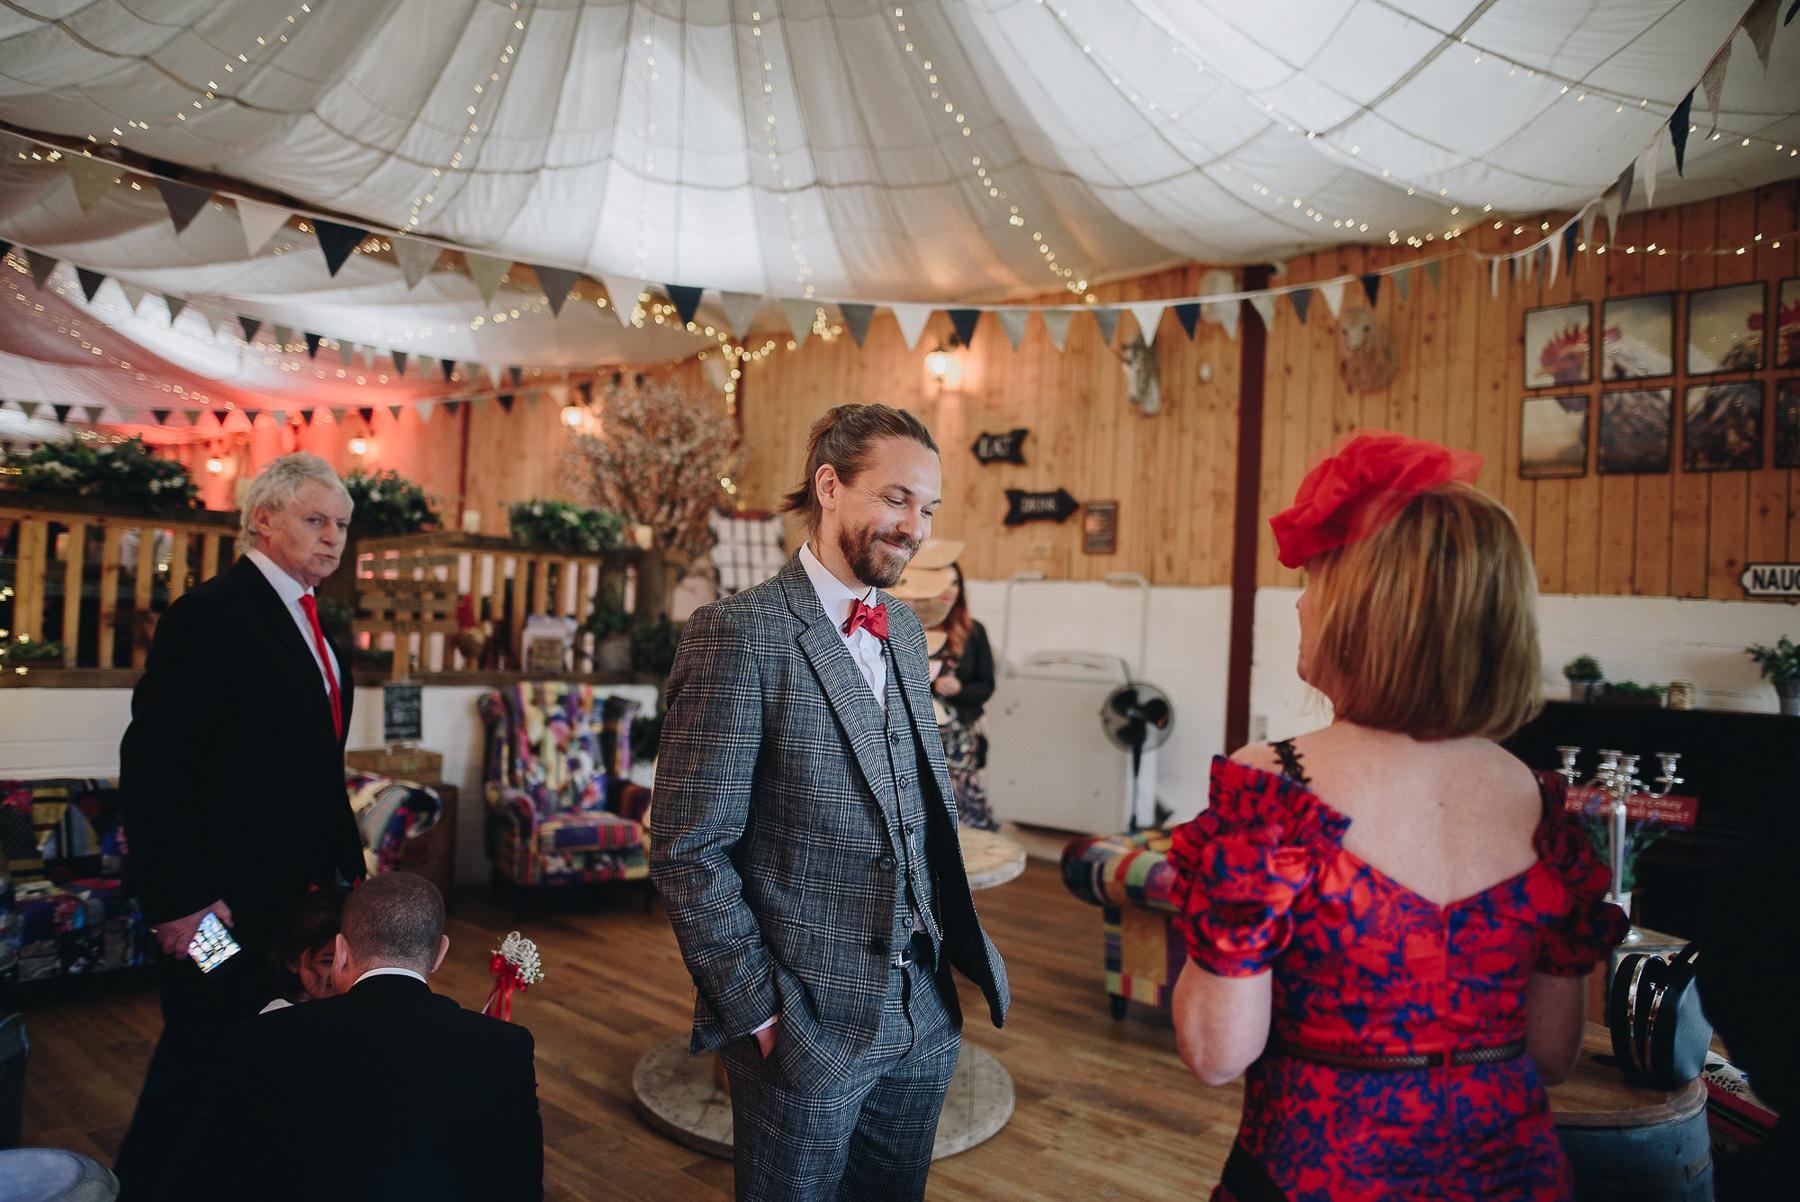 Wellbeing_Farm_Wedding_Photography_The_Pin-Up_Bride_Lara_Shaun-39.jpg